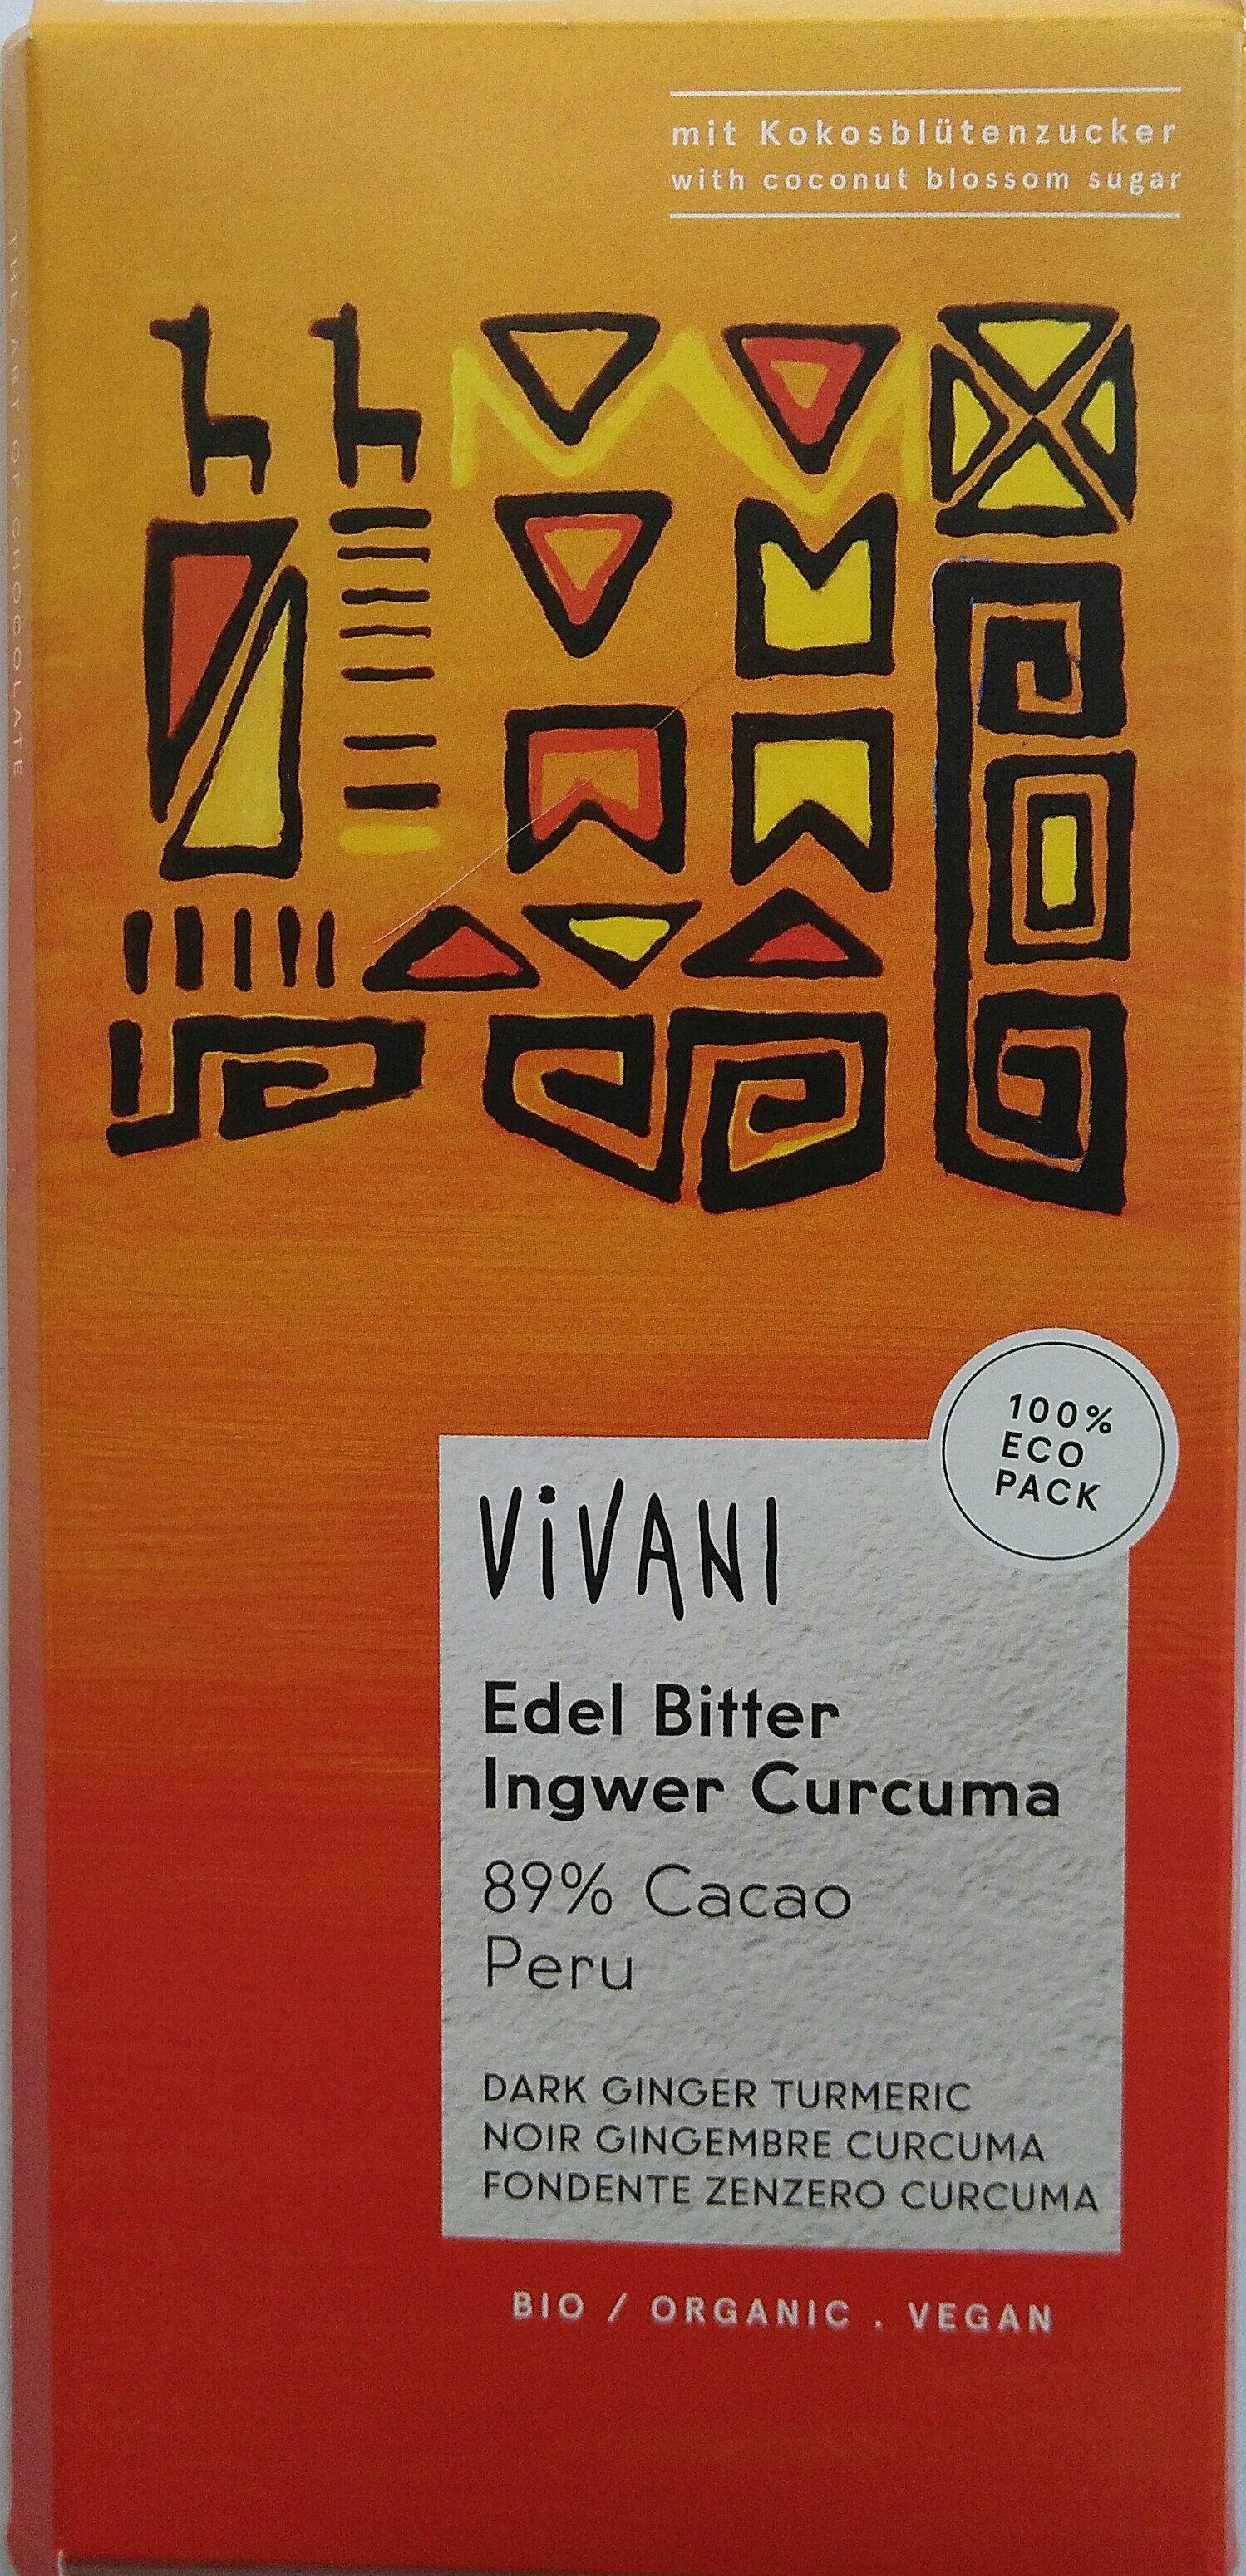 Edel Bitter Ingwer Curcuma - Produkt - cs